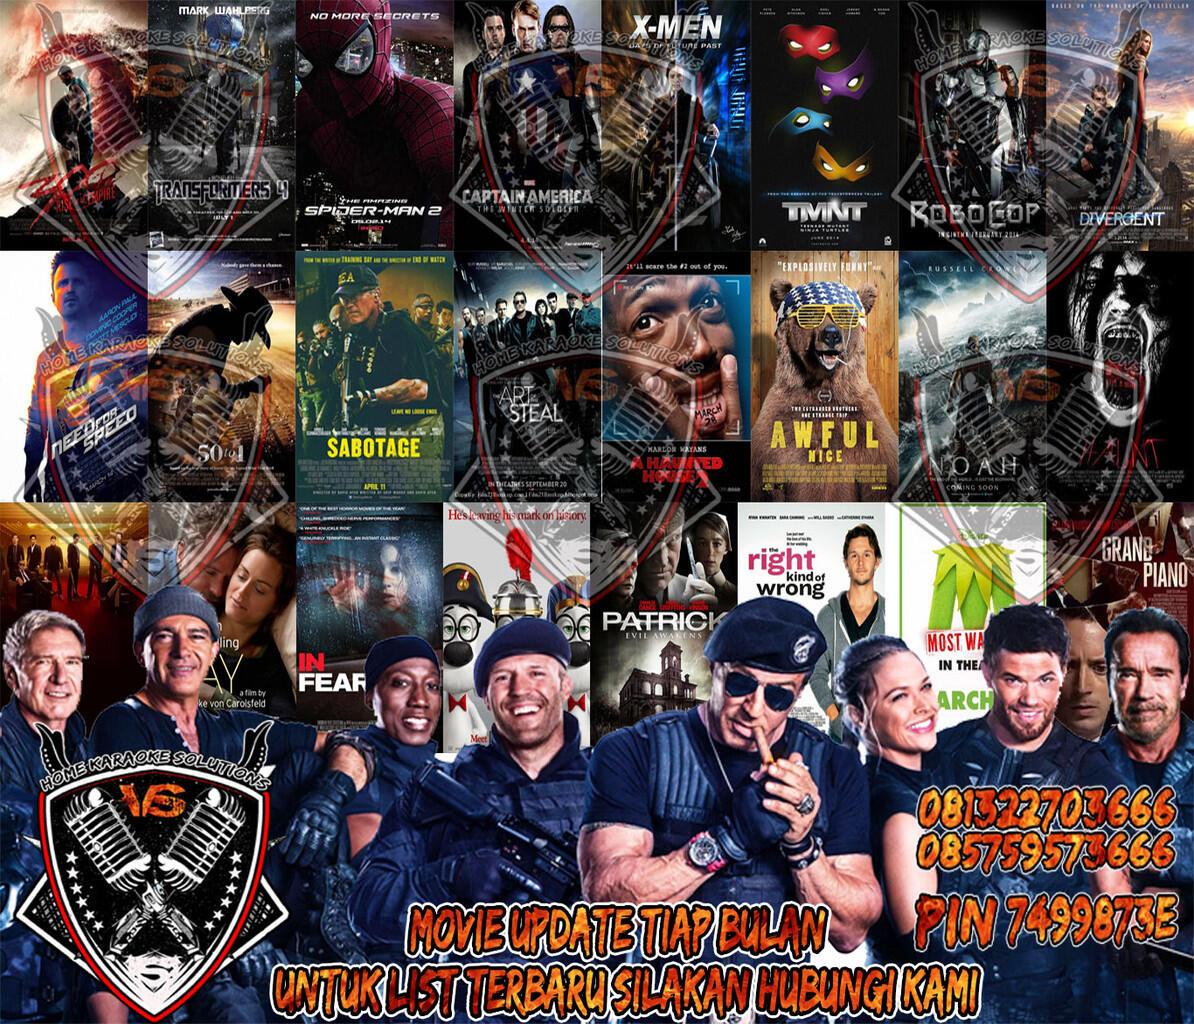 Terjual Sony Karaoke Paket Pc Hdd Dvd Maret 2014 Harddisk Movies Bluray Beta Film 1 Tb 1tb